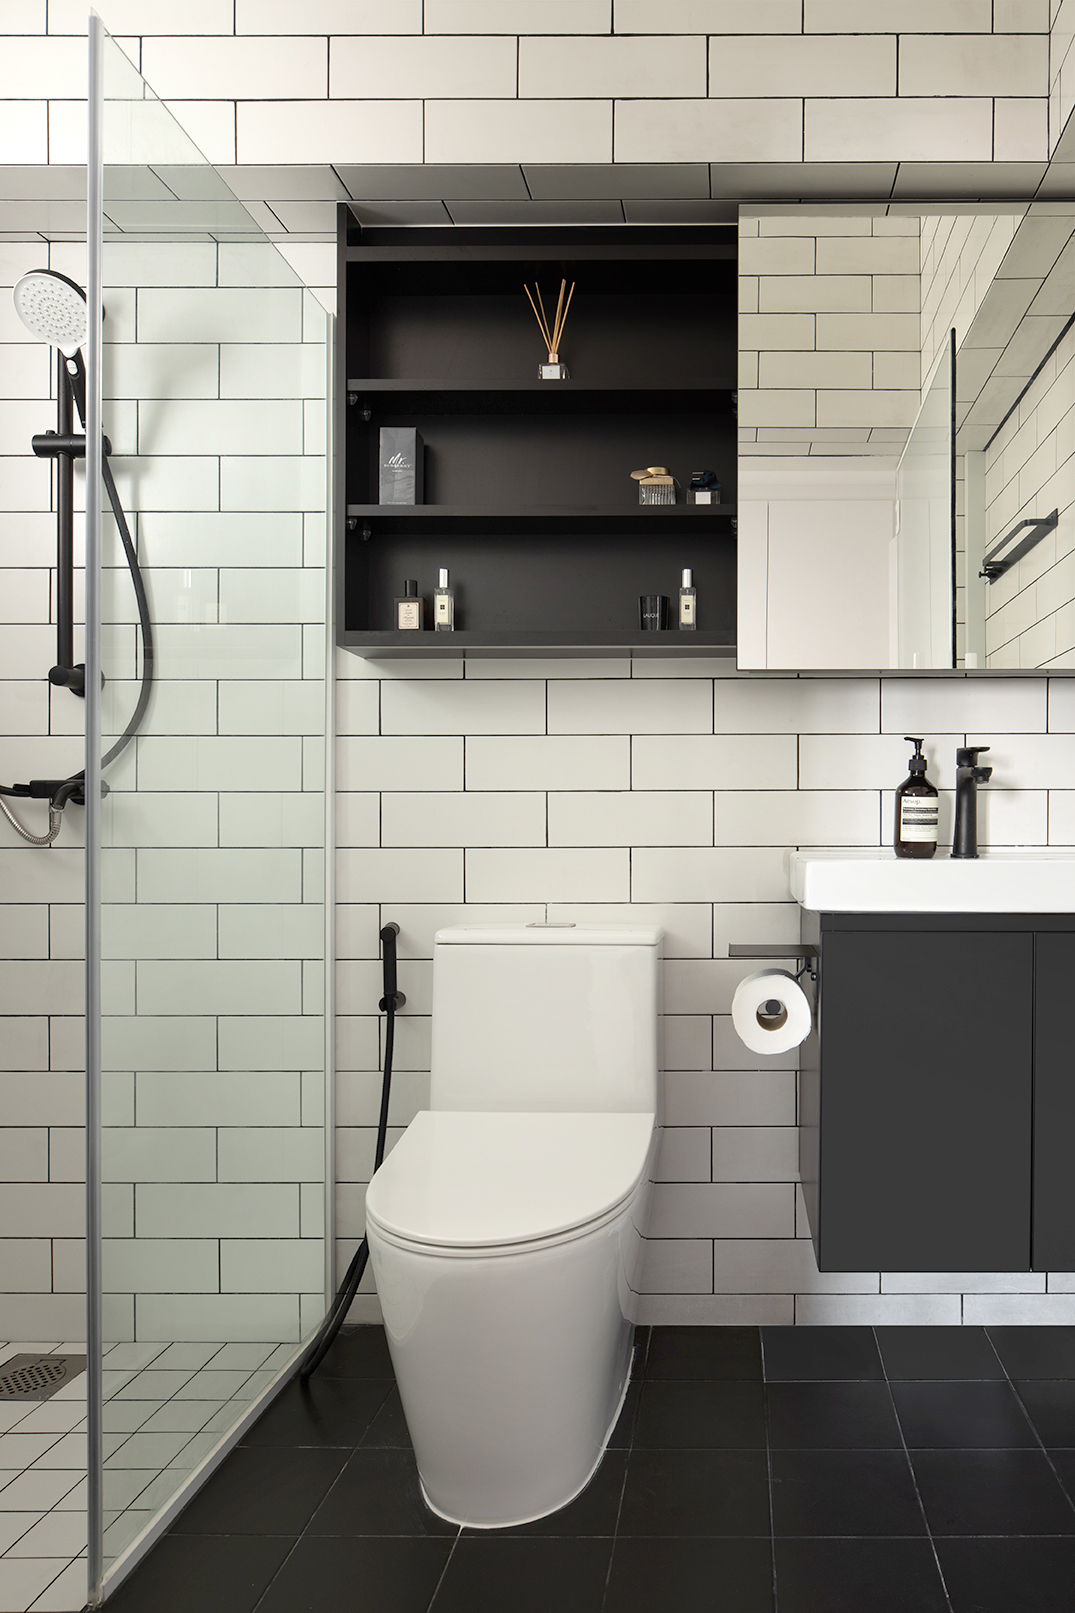 Ascend Design Interior Boon Tiong Rd bath2-